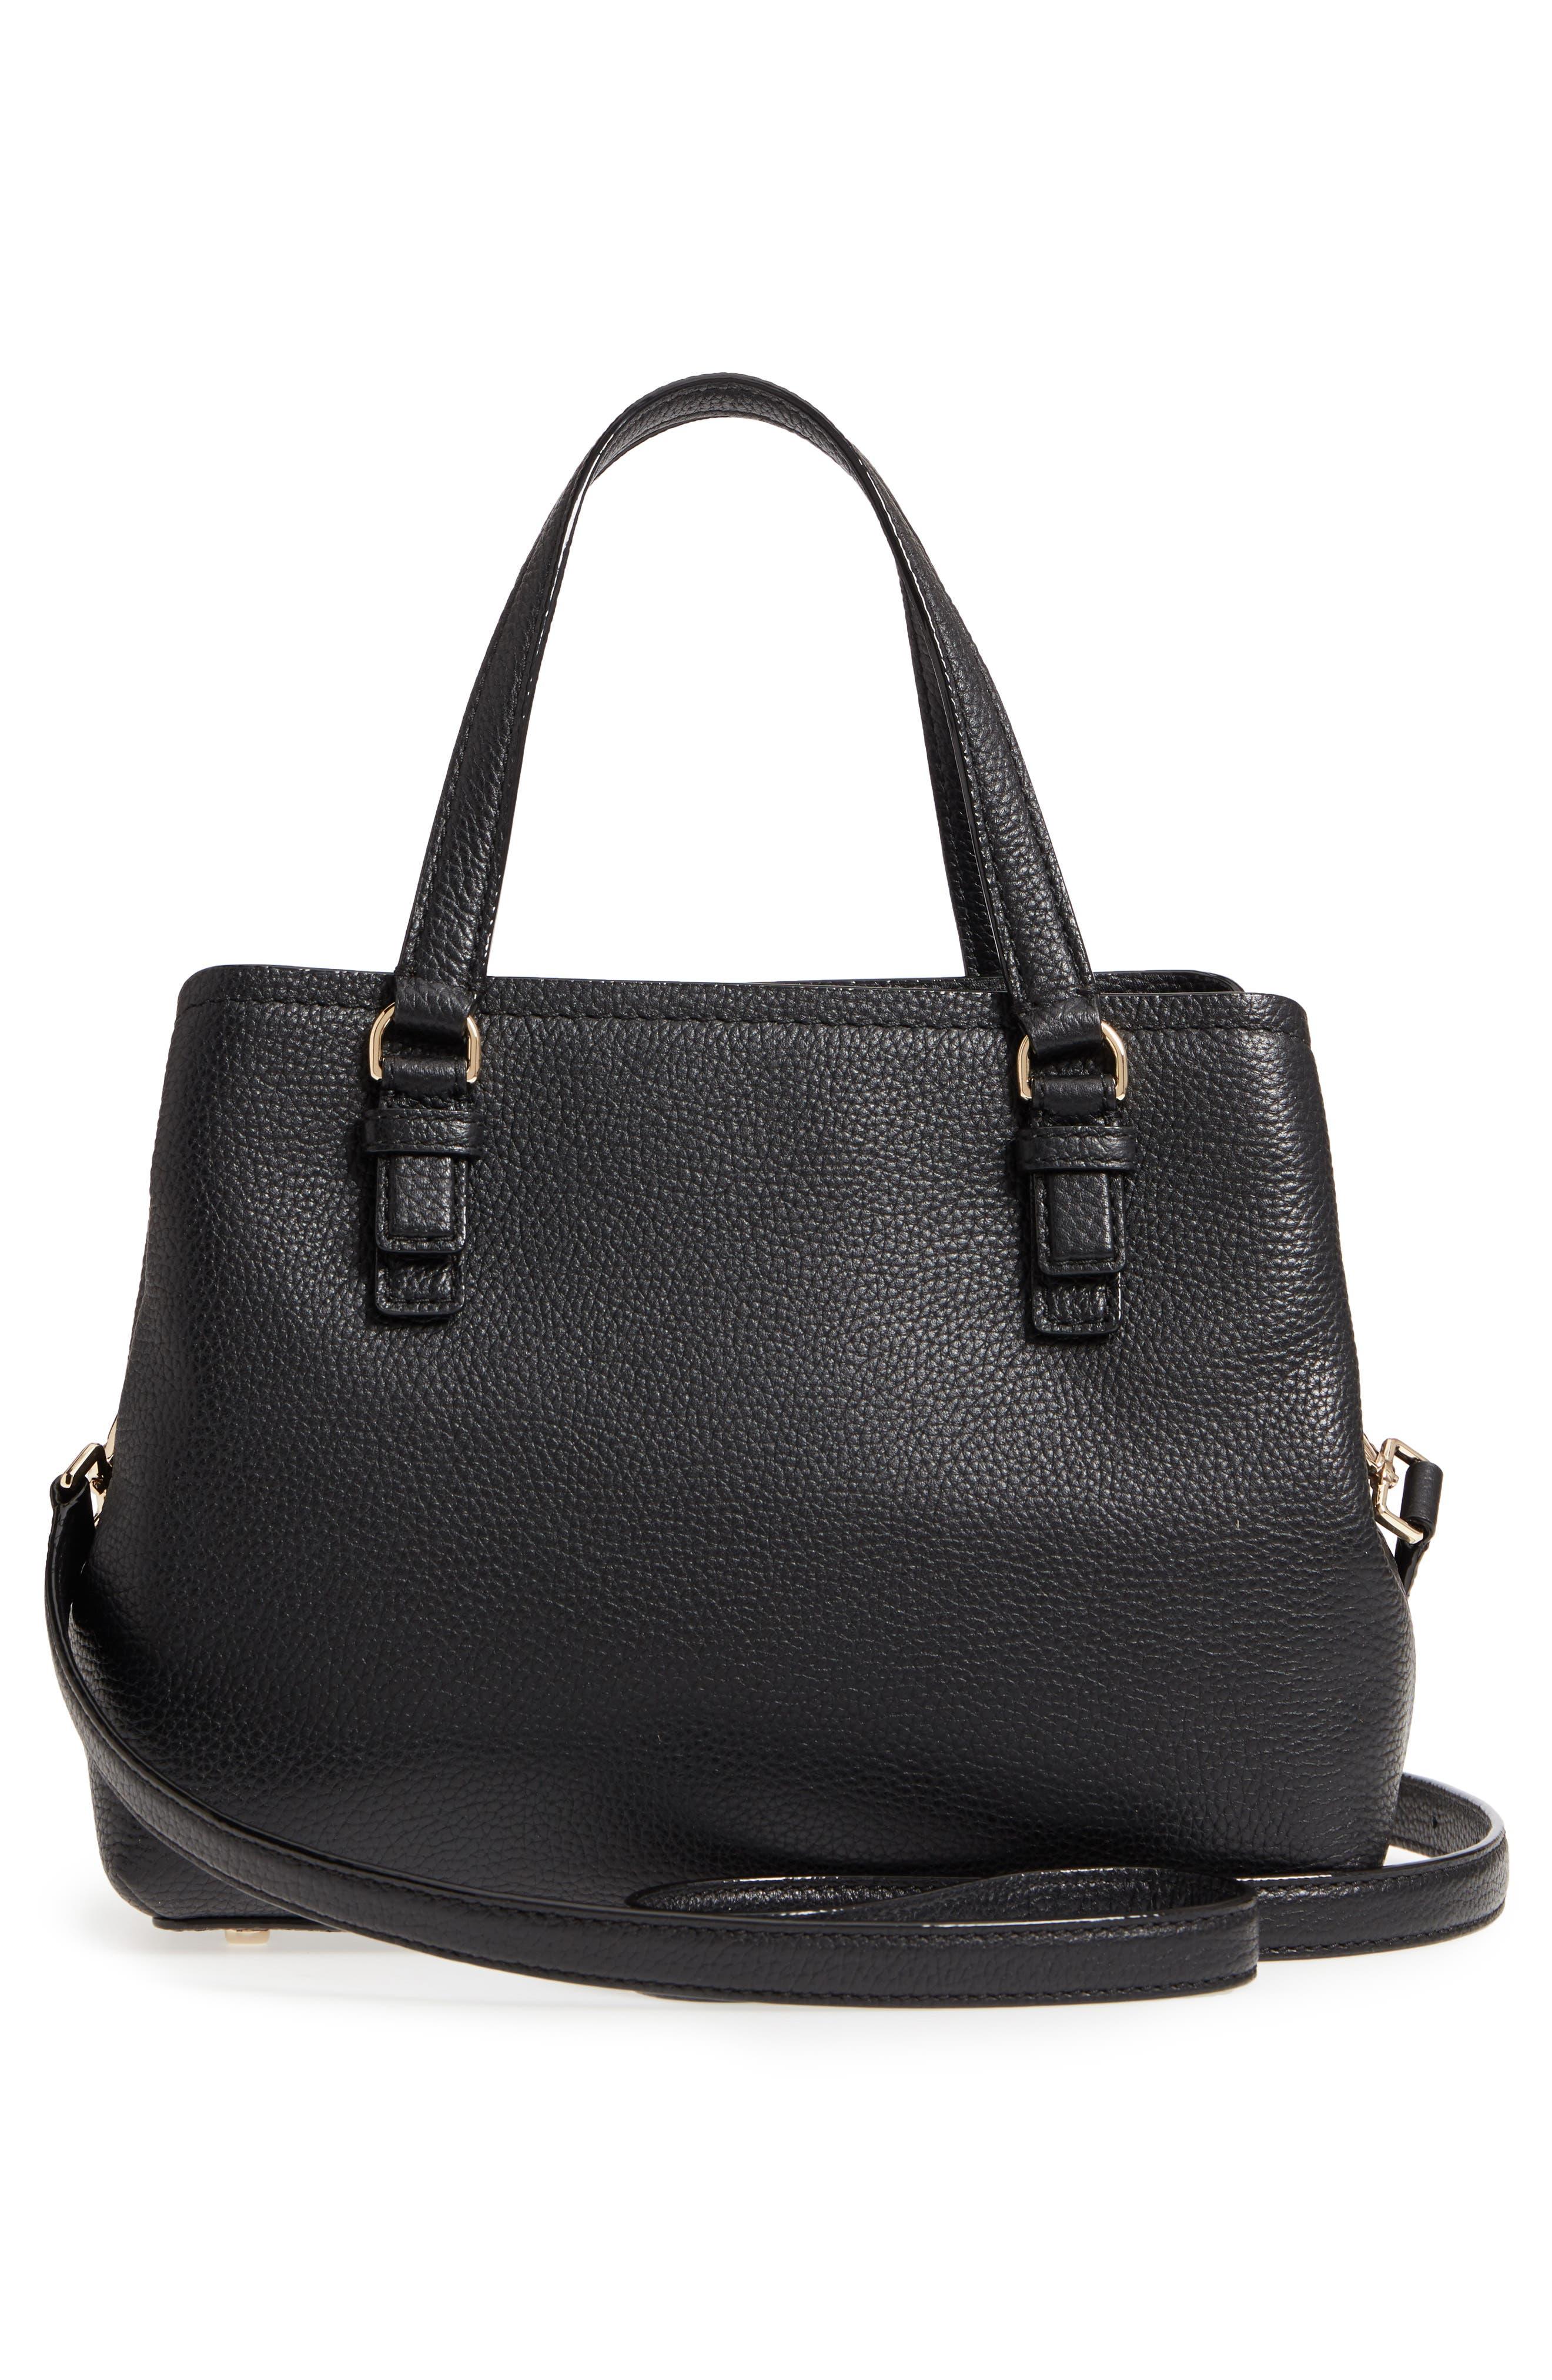 jackson street – small octavia leather satchel,                             Alternate thumbnail 3, color,                             001